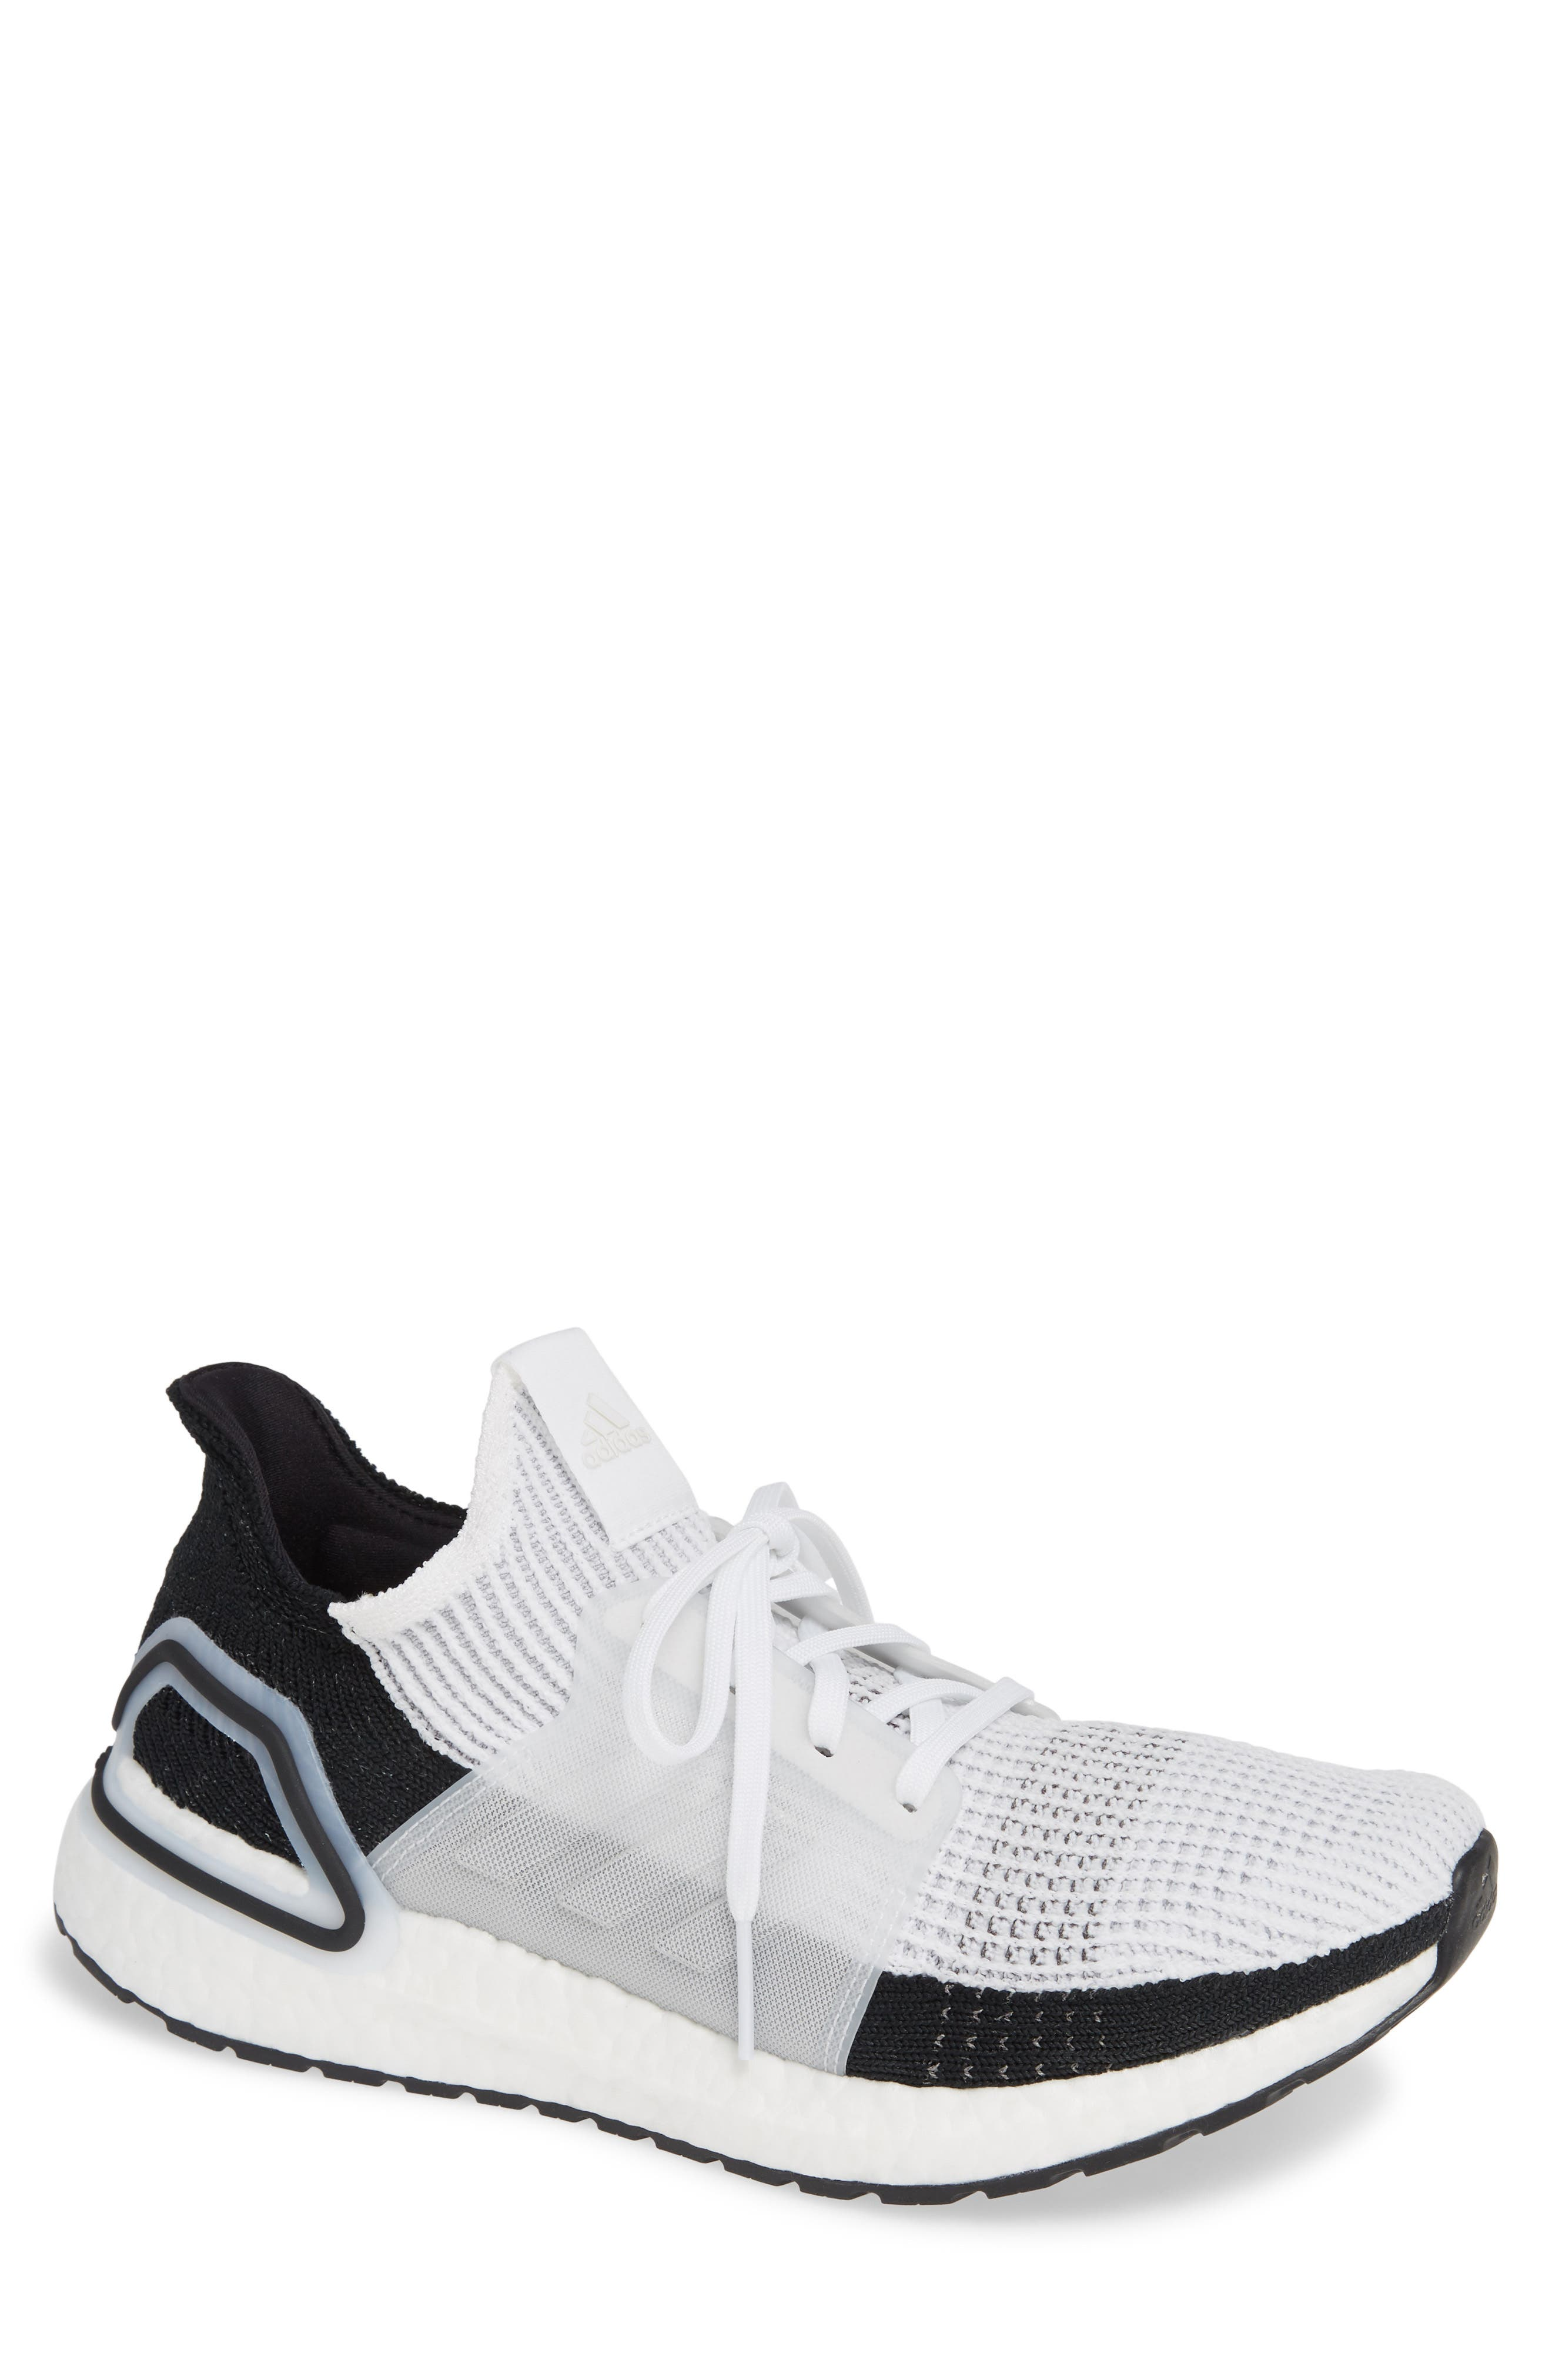 eb70df5cb Adidas Originals Ultraboost 19 Running Shoe In White  White  Grey ...